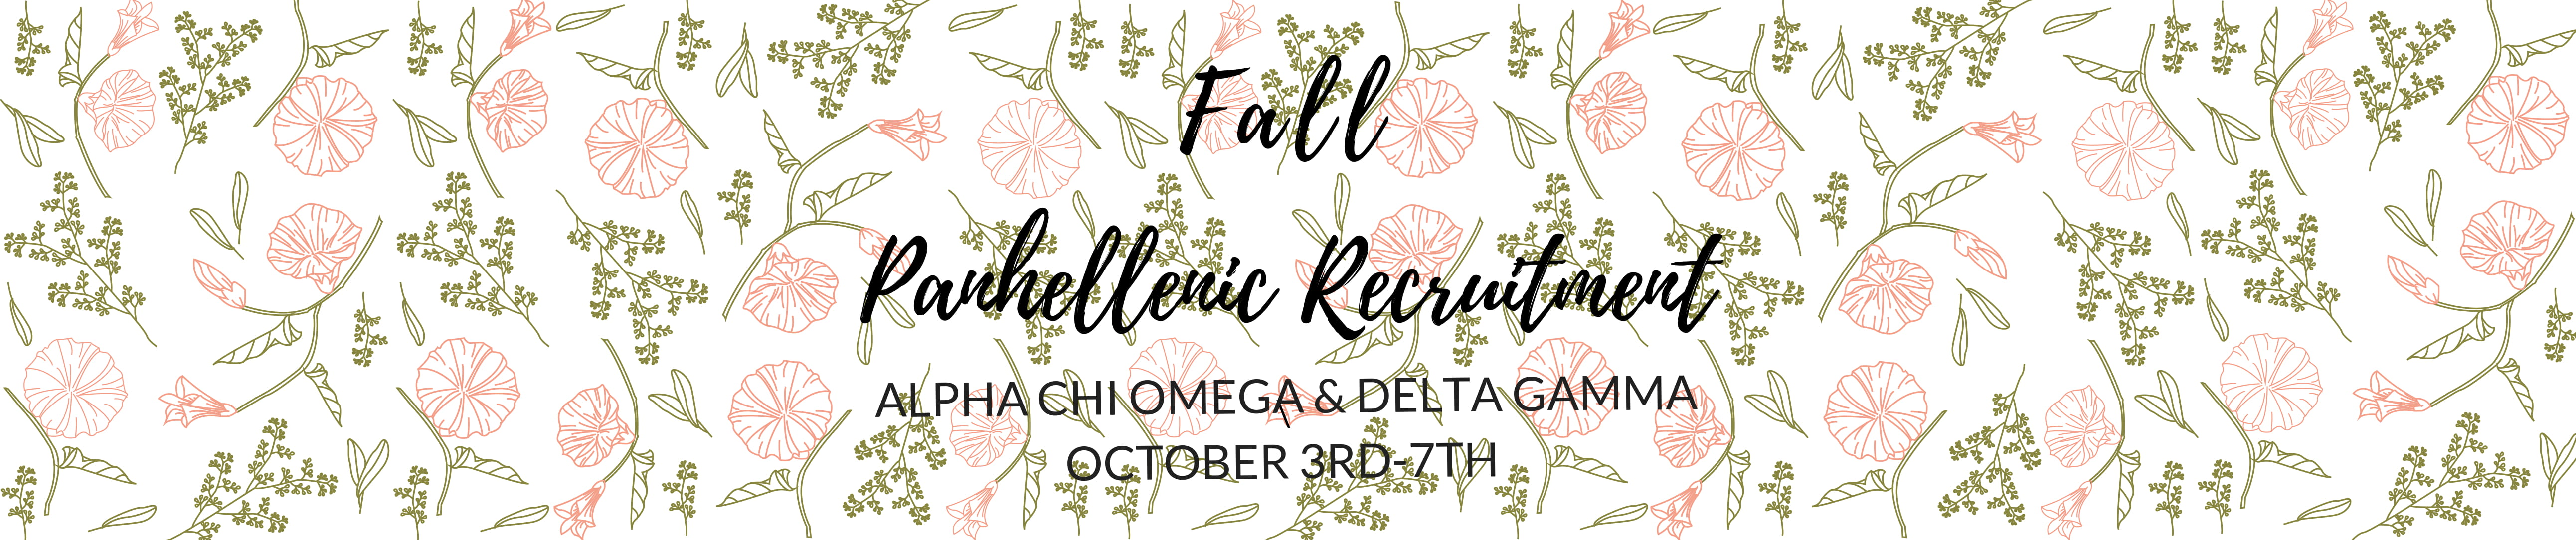 2018 Fall Sorority Recruitment